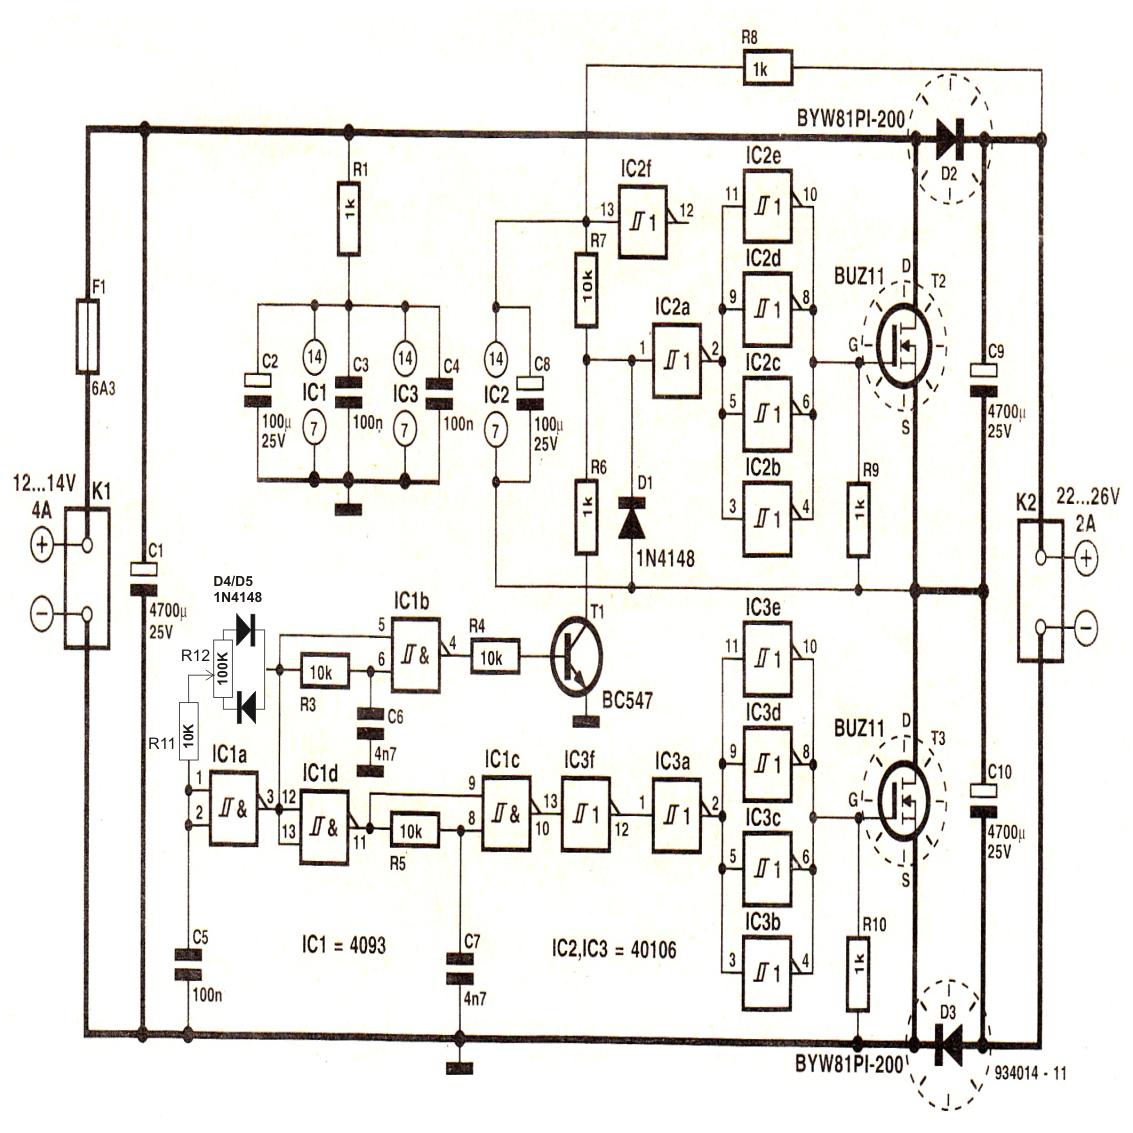 medium resolution of laptop power supply for car circuit schematic electronics schema laptop power supply for car circuit schematic